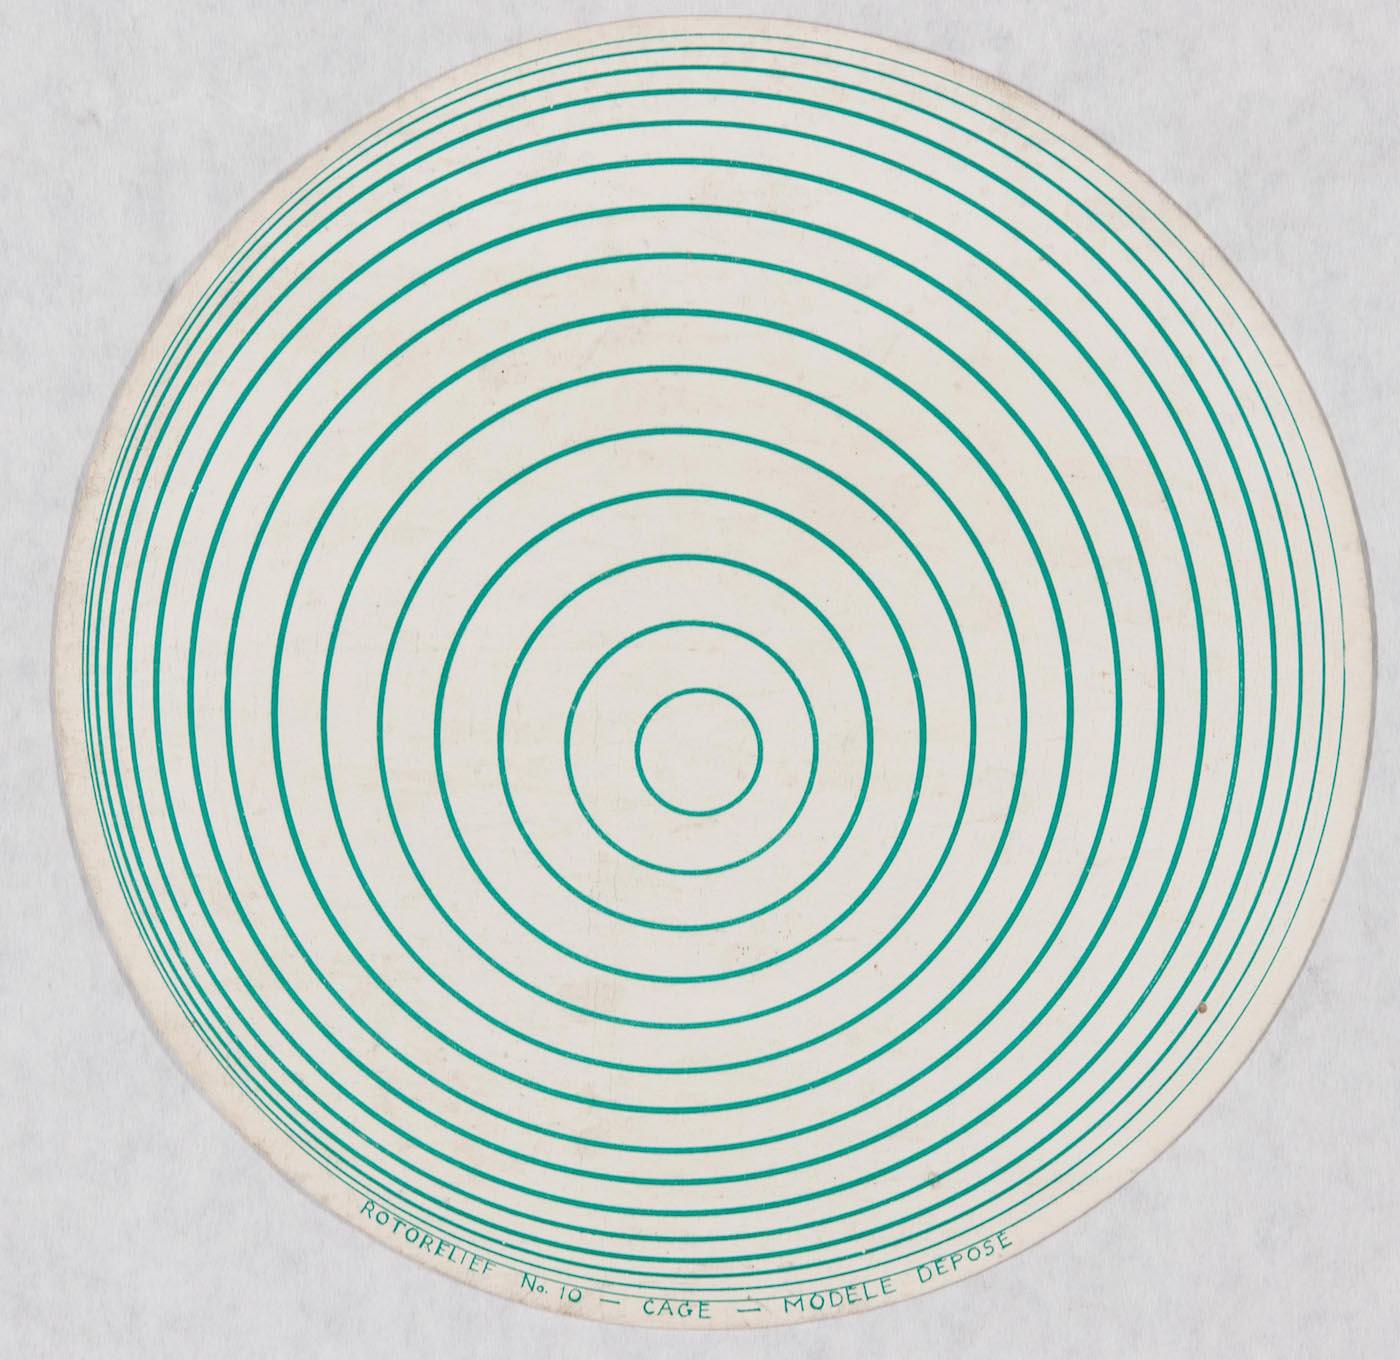 Marcel Duchamp Corolles MDuchamp cover 1920